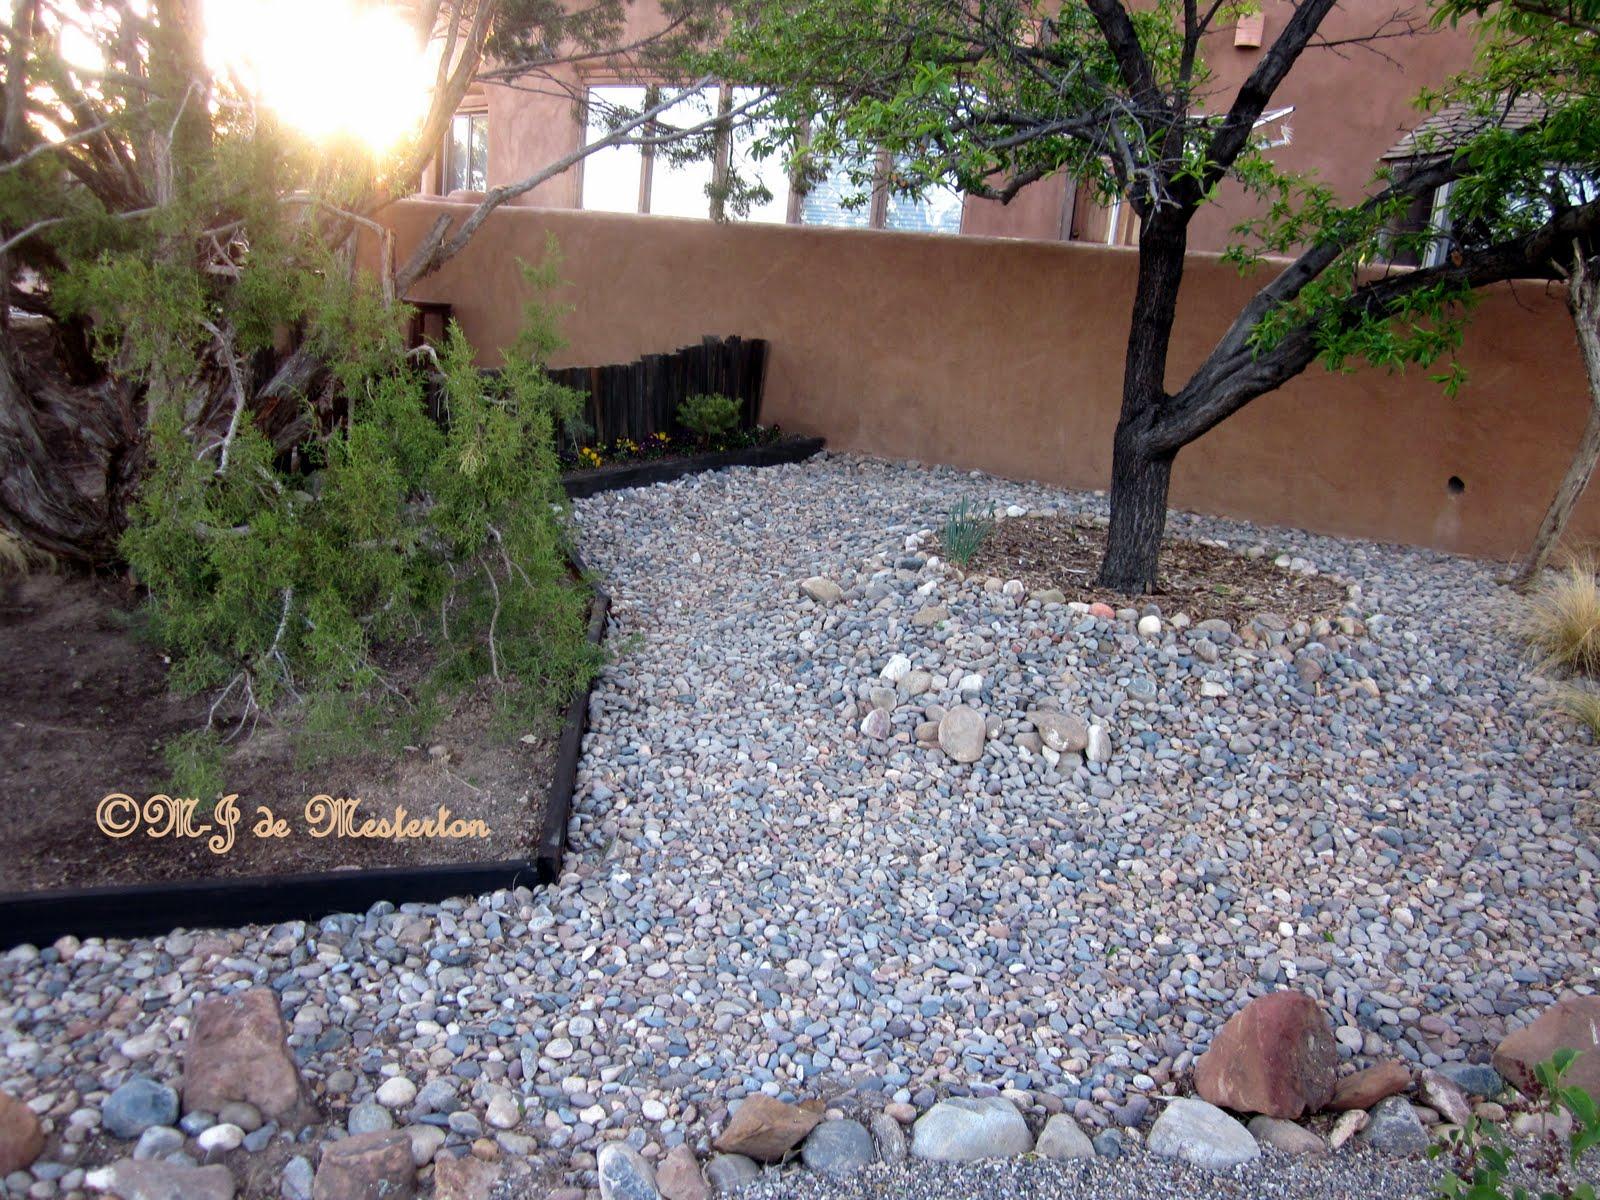 Elegant gardening tree mulching for water conservation for Garden design ideas using gravel